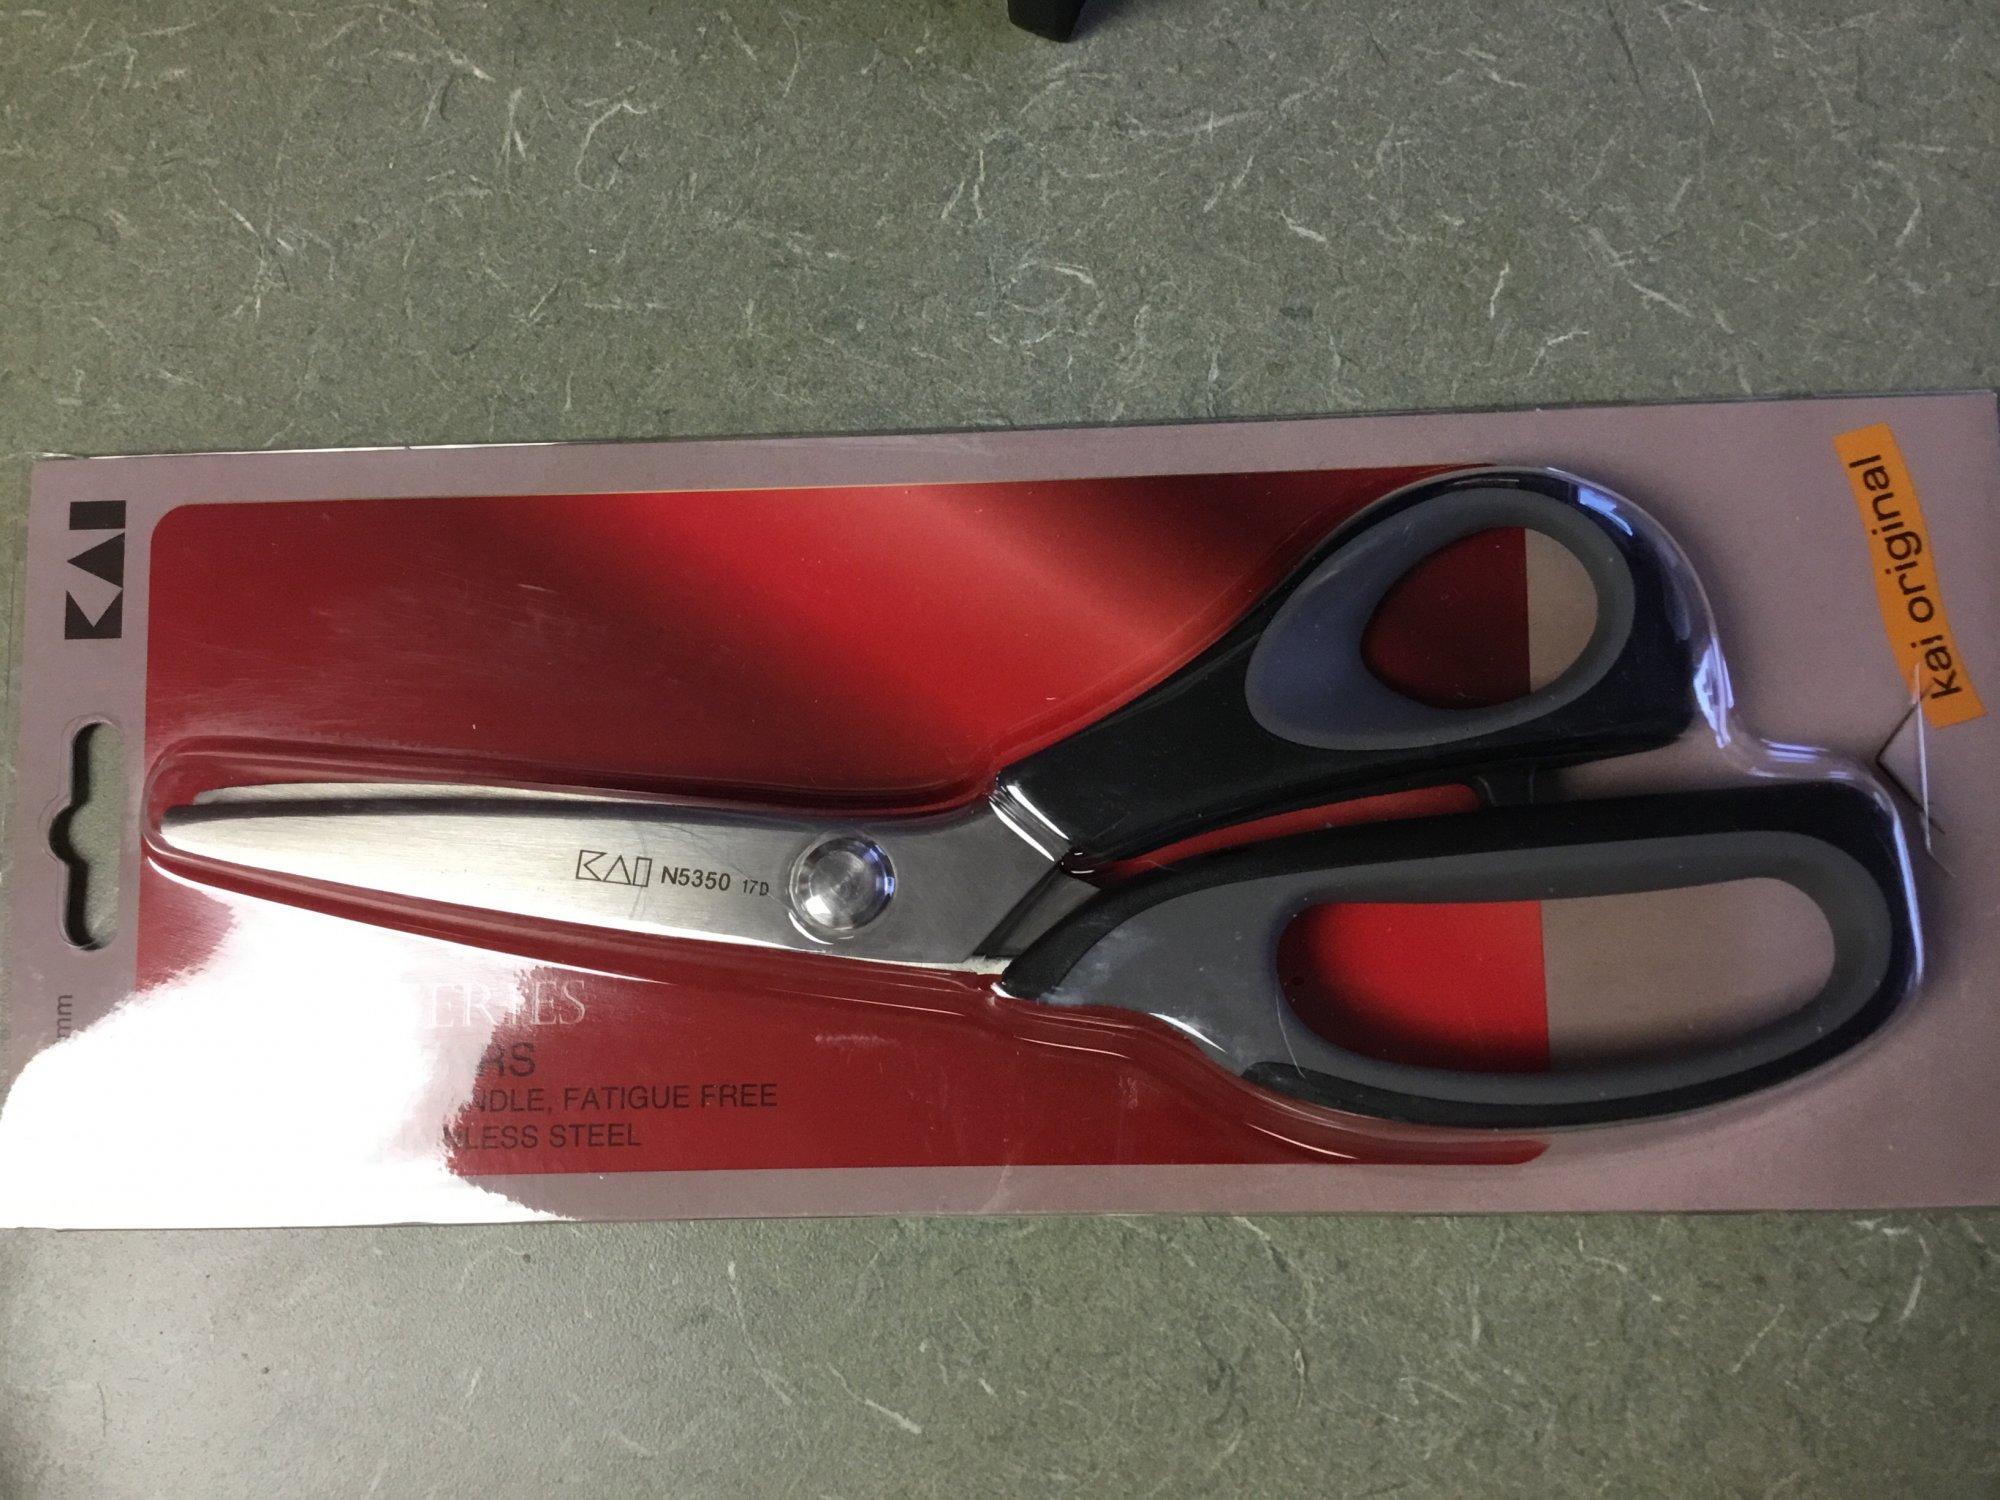 KAI N5000 Series 9 inch Pinking Shears N5350